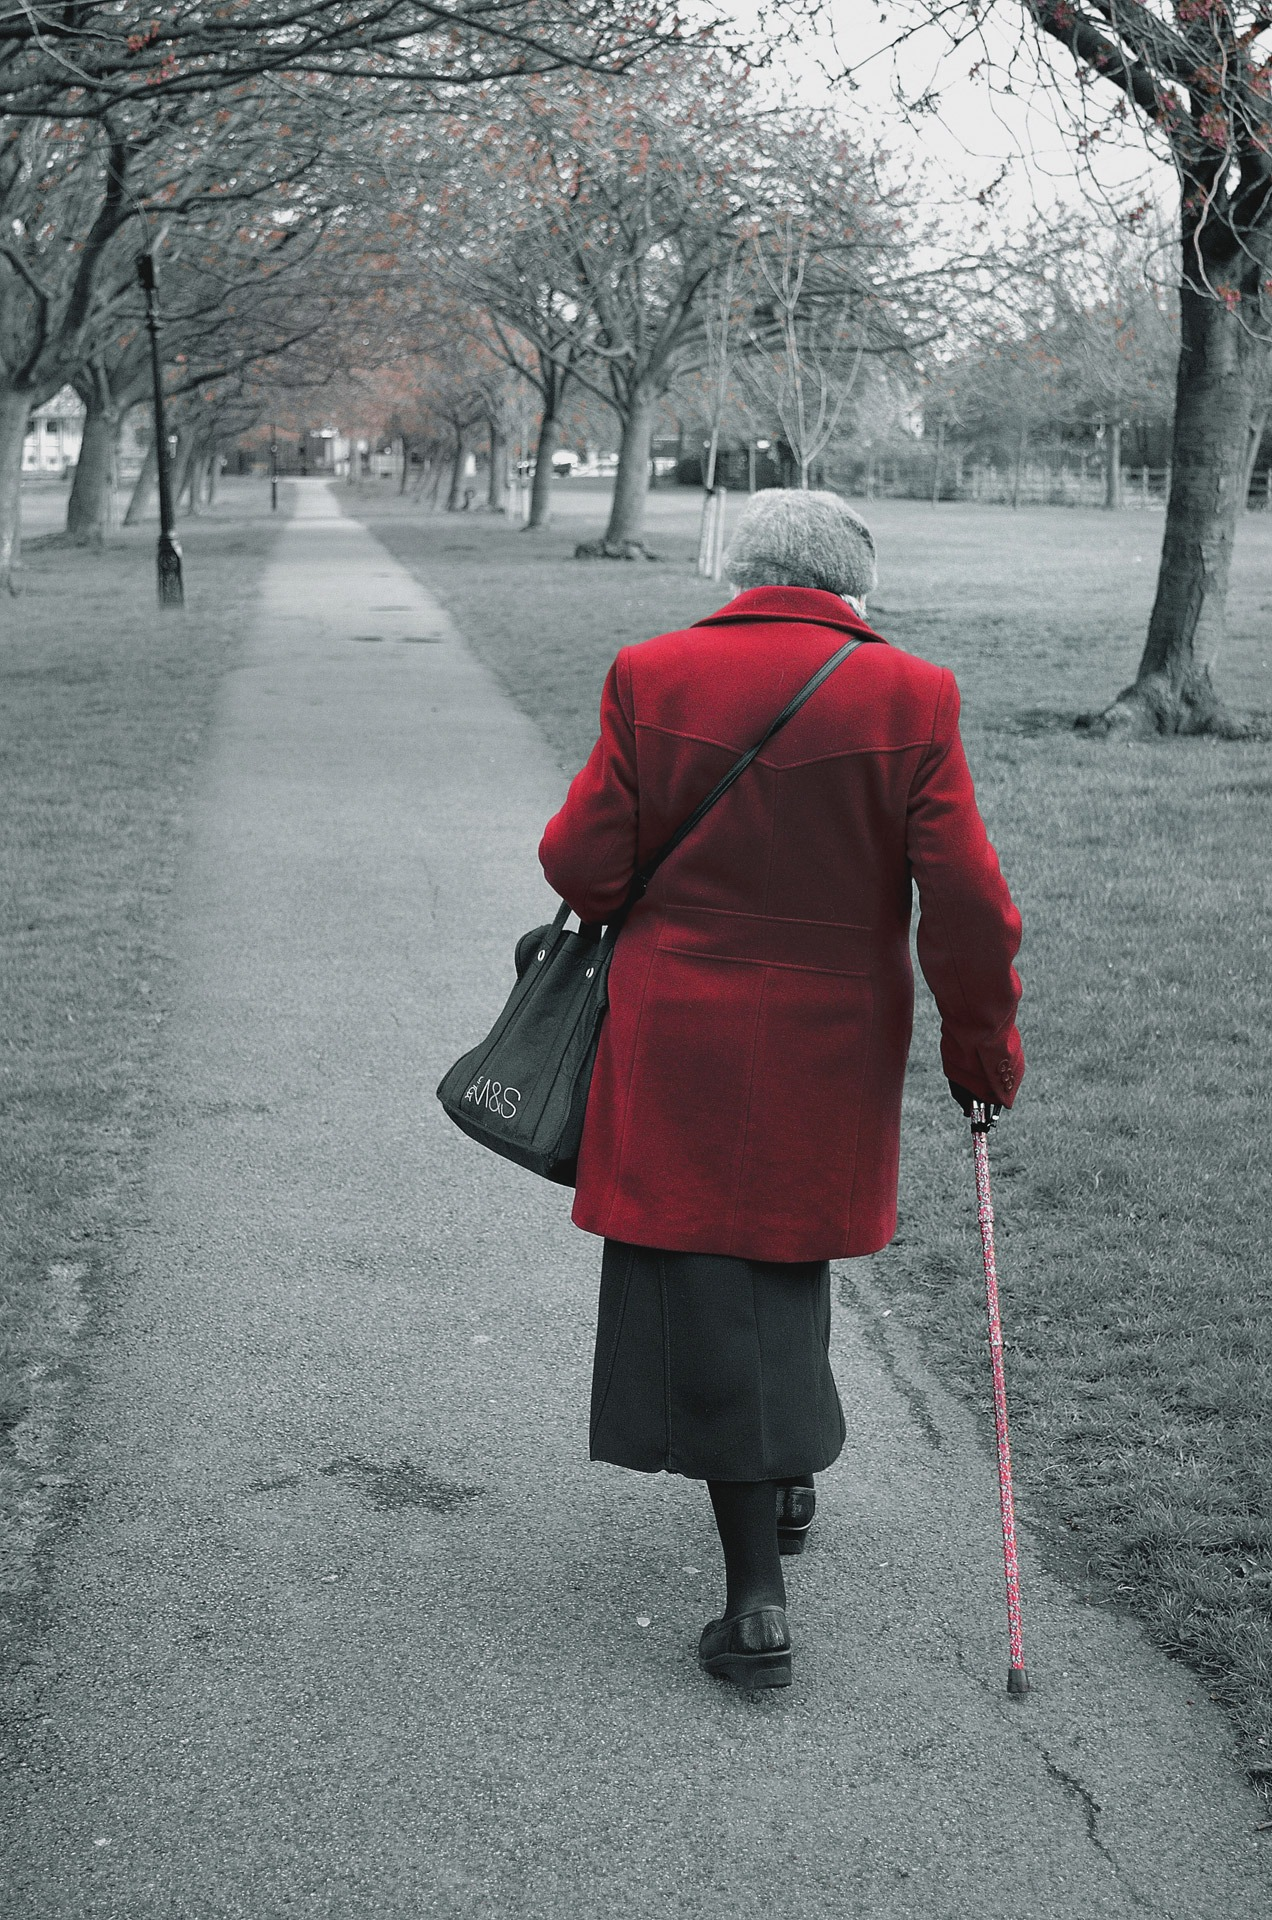 walking-69708.jpg